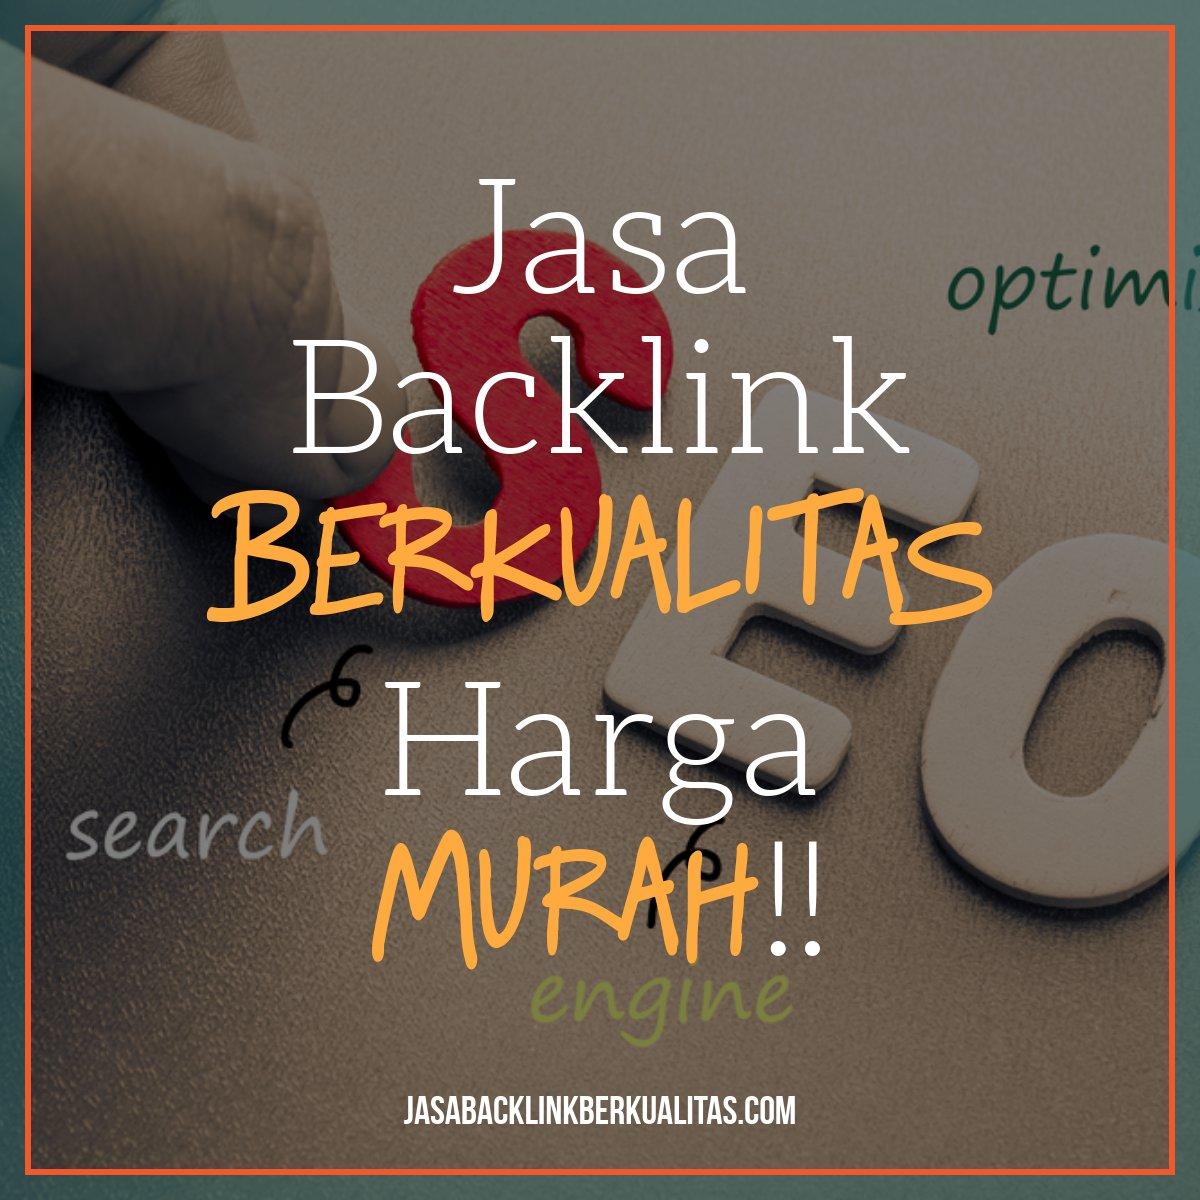 Jasa Backlink Authority Di Indonesia - Direktori SEO Indoenesia